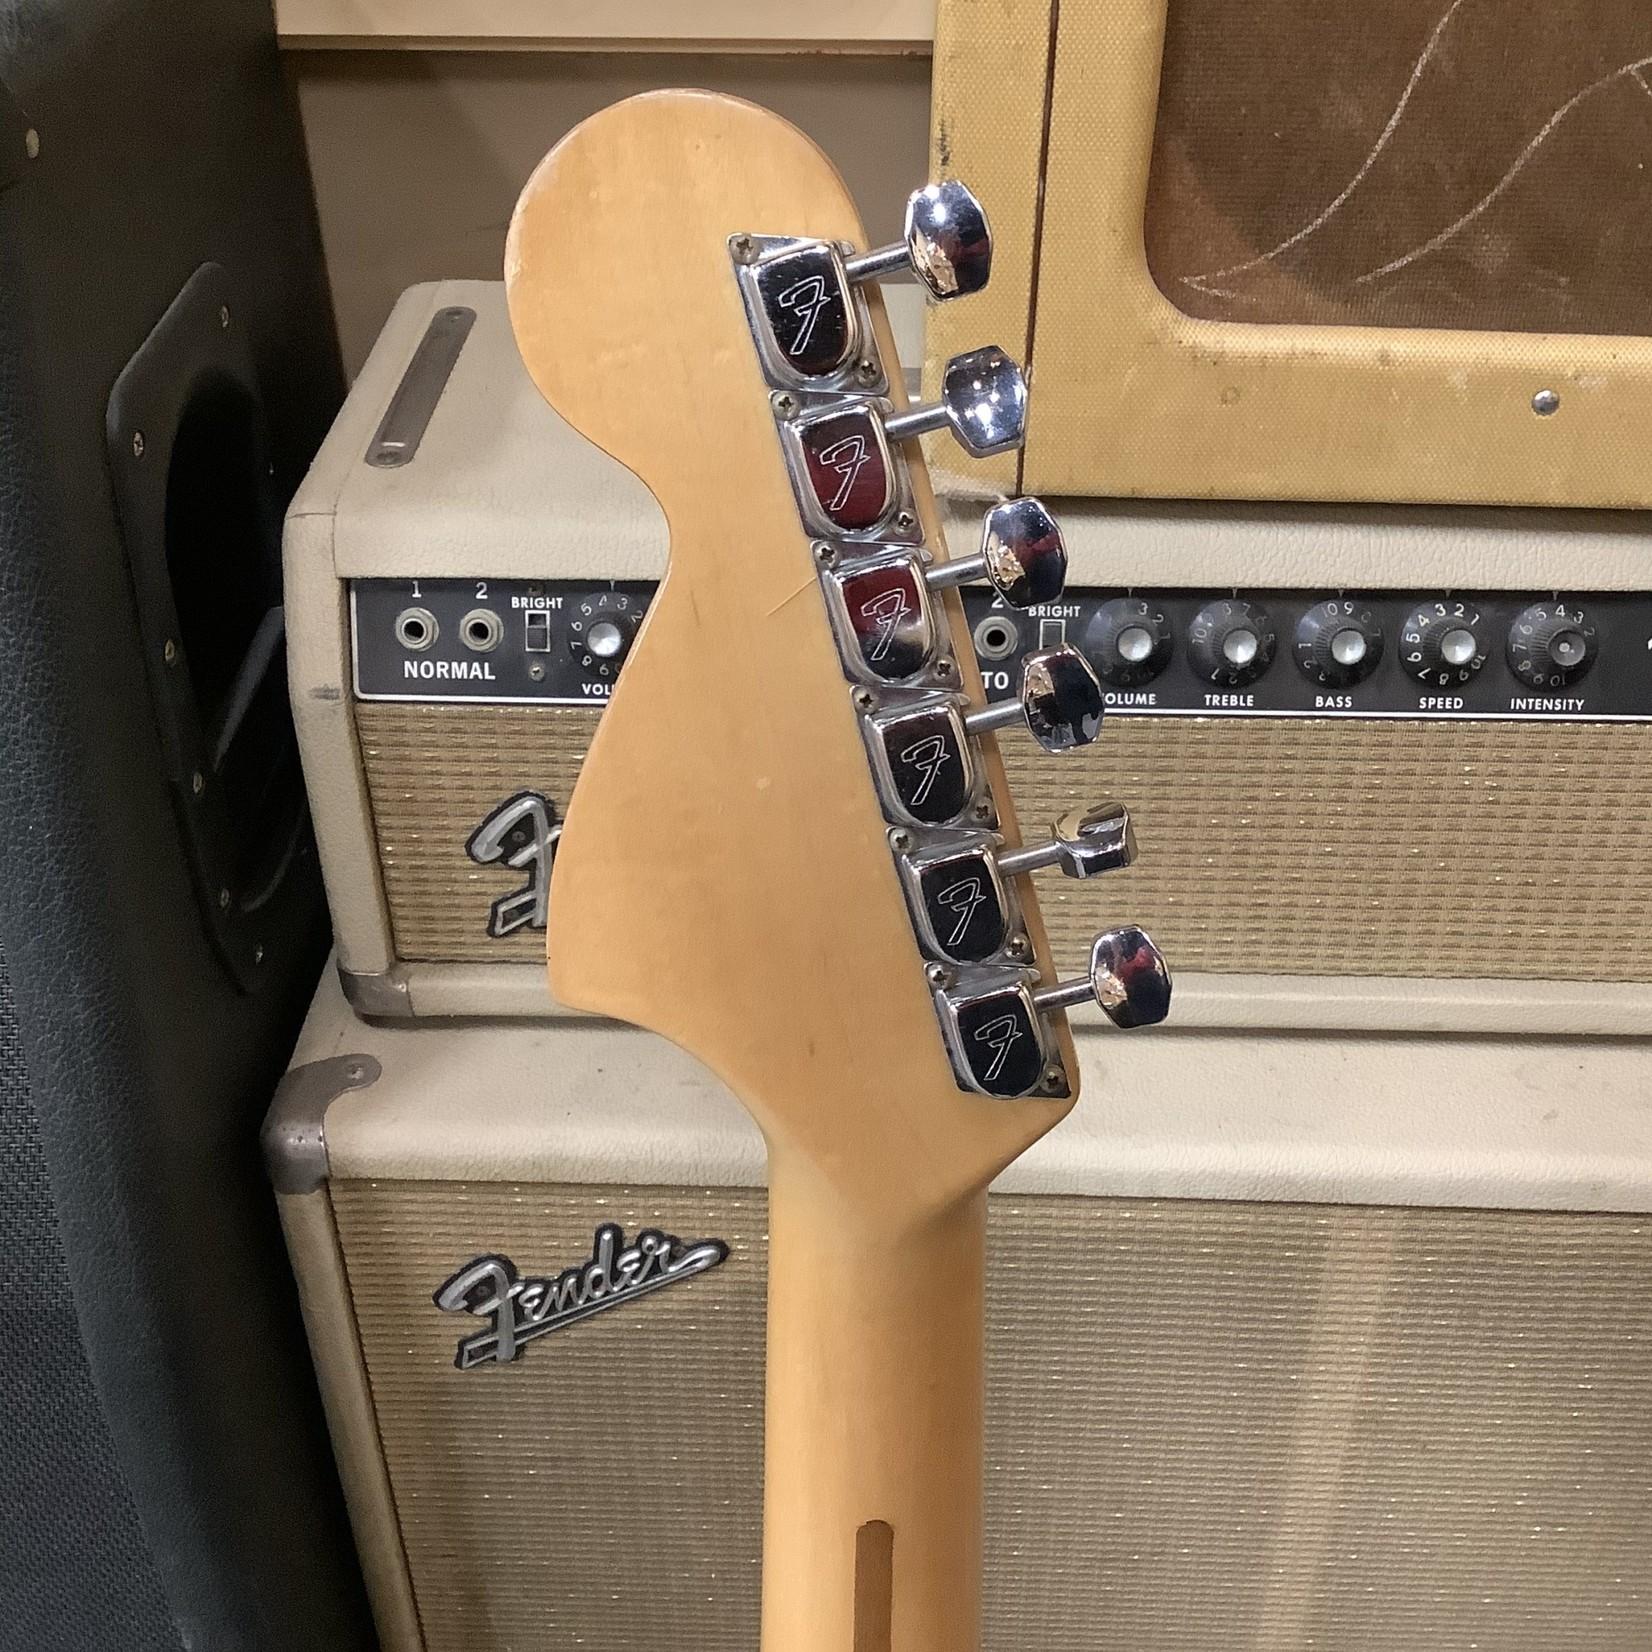 Fender 1976 Fender Stratocaster Blonde Maple Neck 3-Bolt Black Pickguard